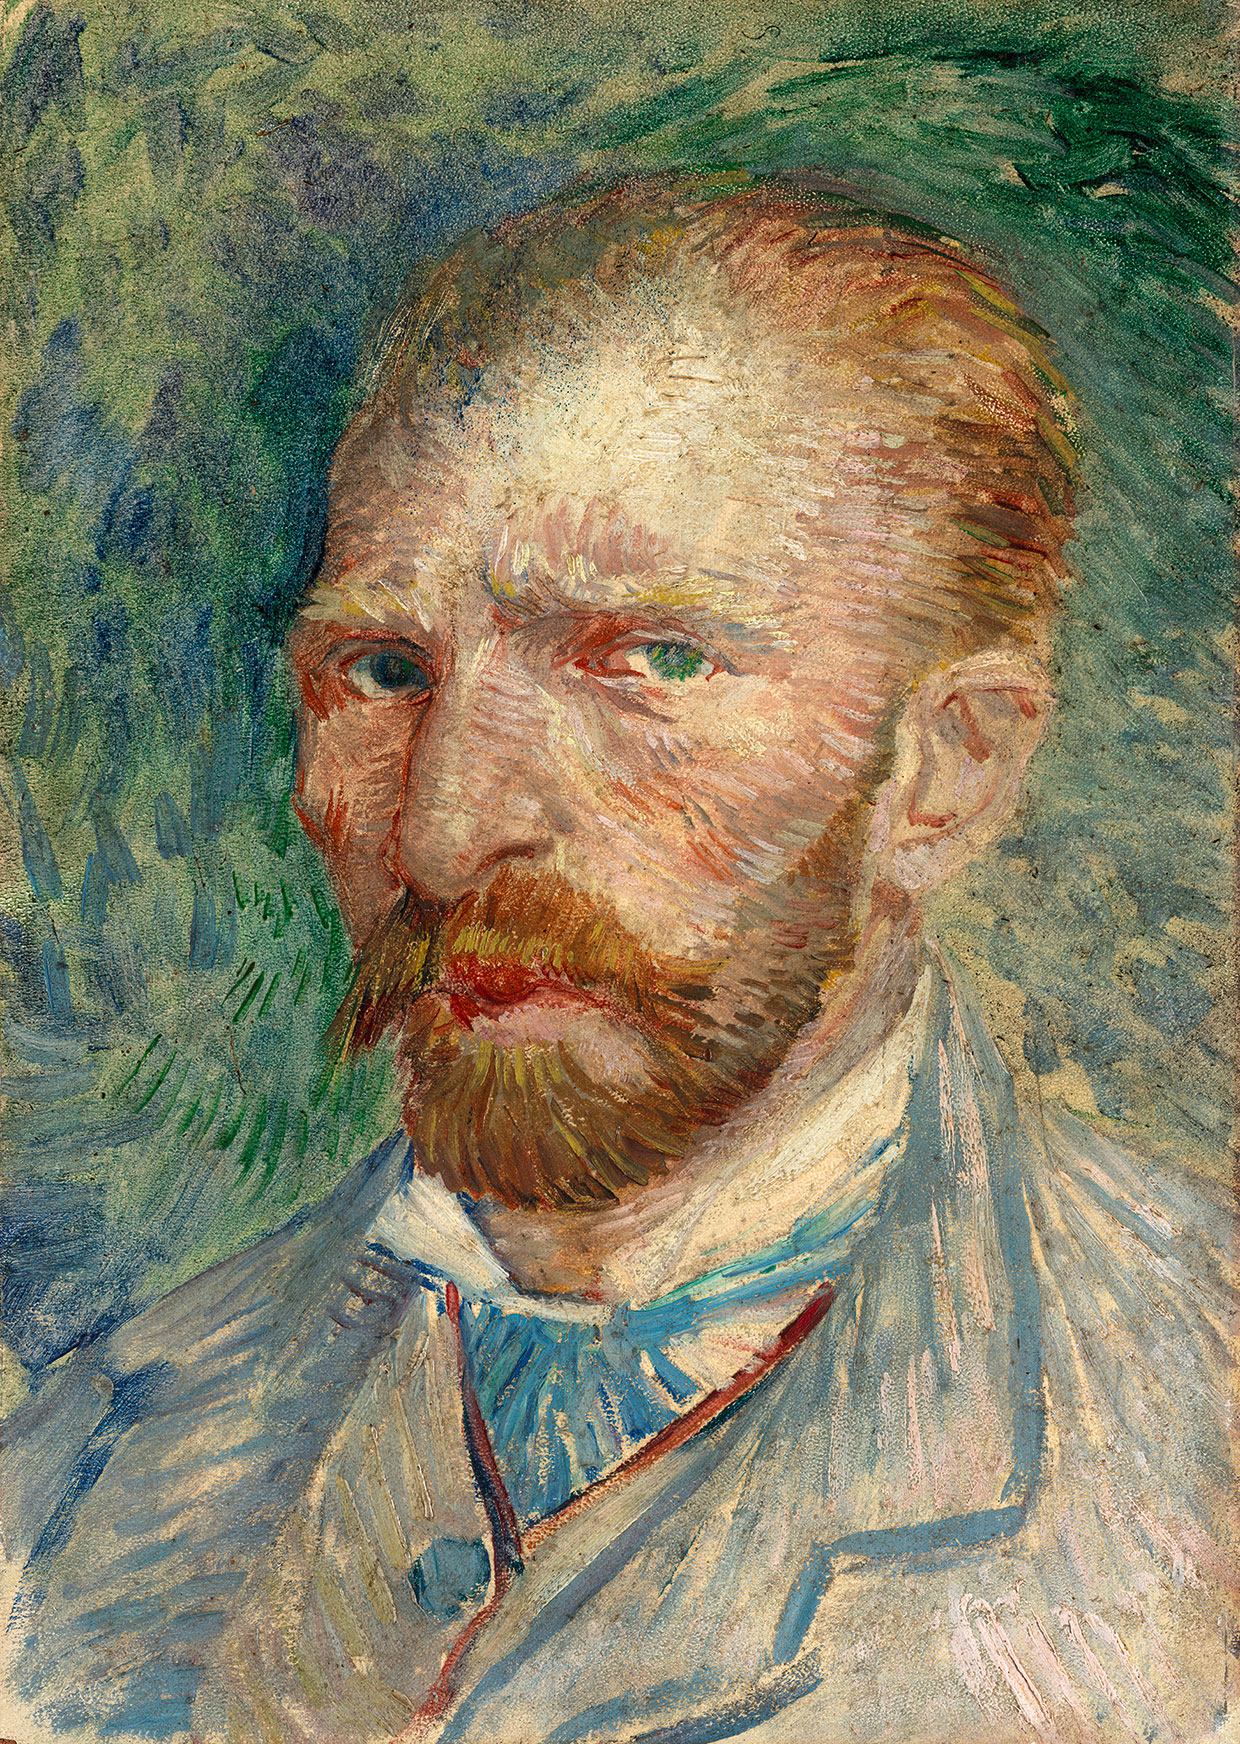 Vincent van Gogh, Self-portrait, 1887. Coll. Kröller-Müller Museum, Otterlo